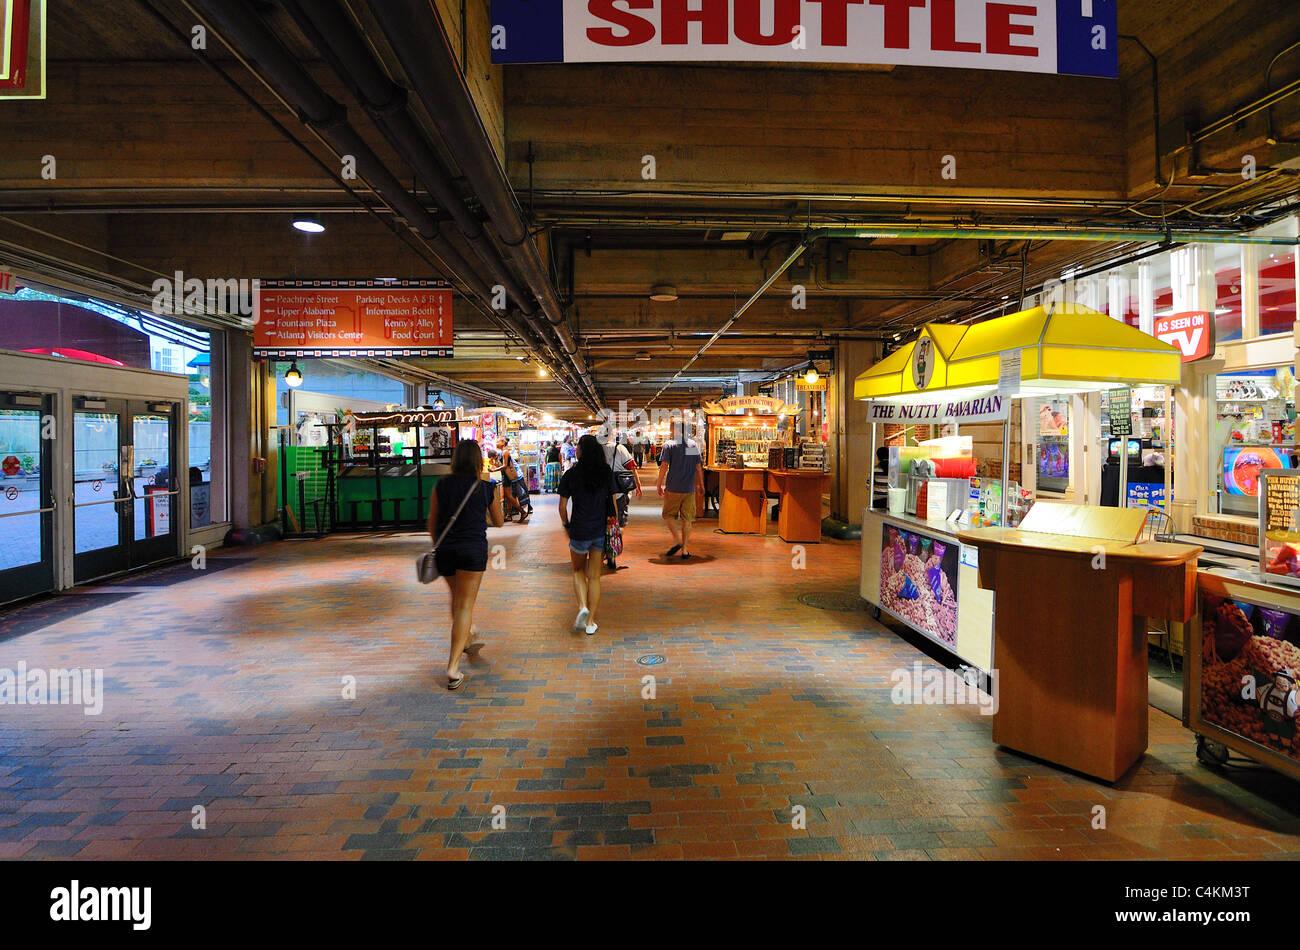 Shops and arcade at Underground in Atlanta, Georgia. - Stock Image